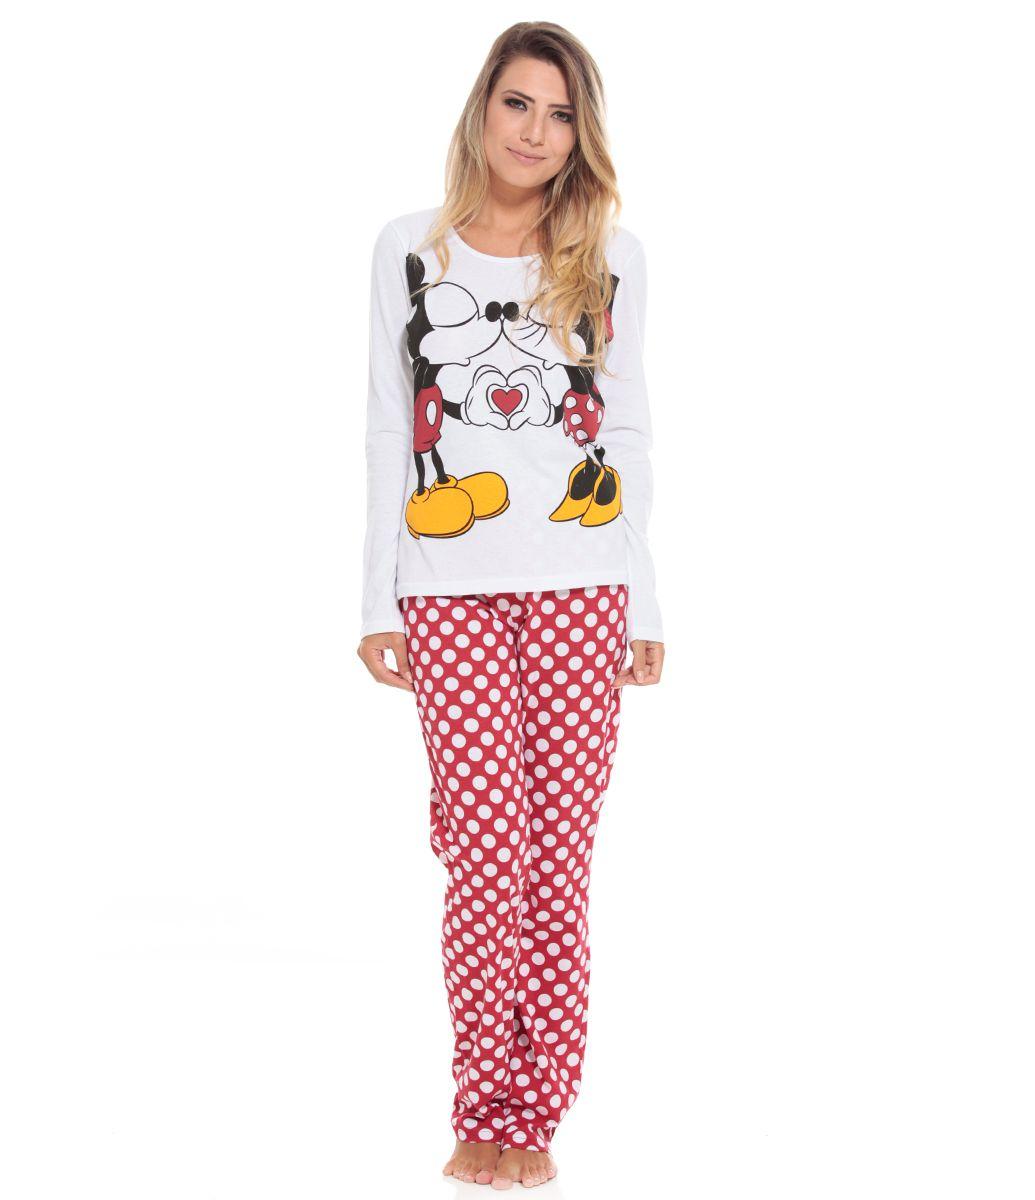 0d45669c371f70 Pijama Feminino Manga longa Gola redonda Estampa do Mickey e Minnie ...